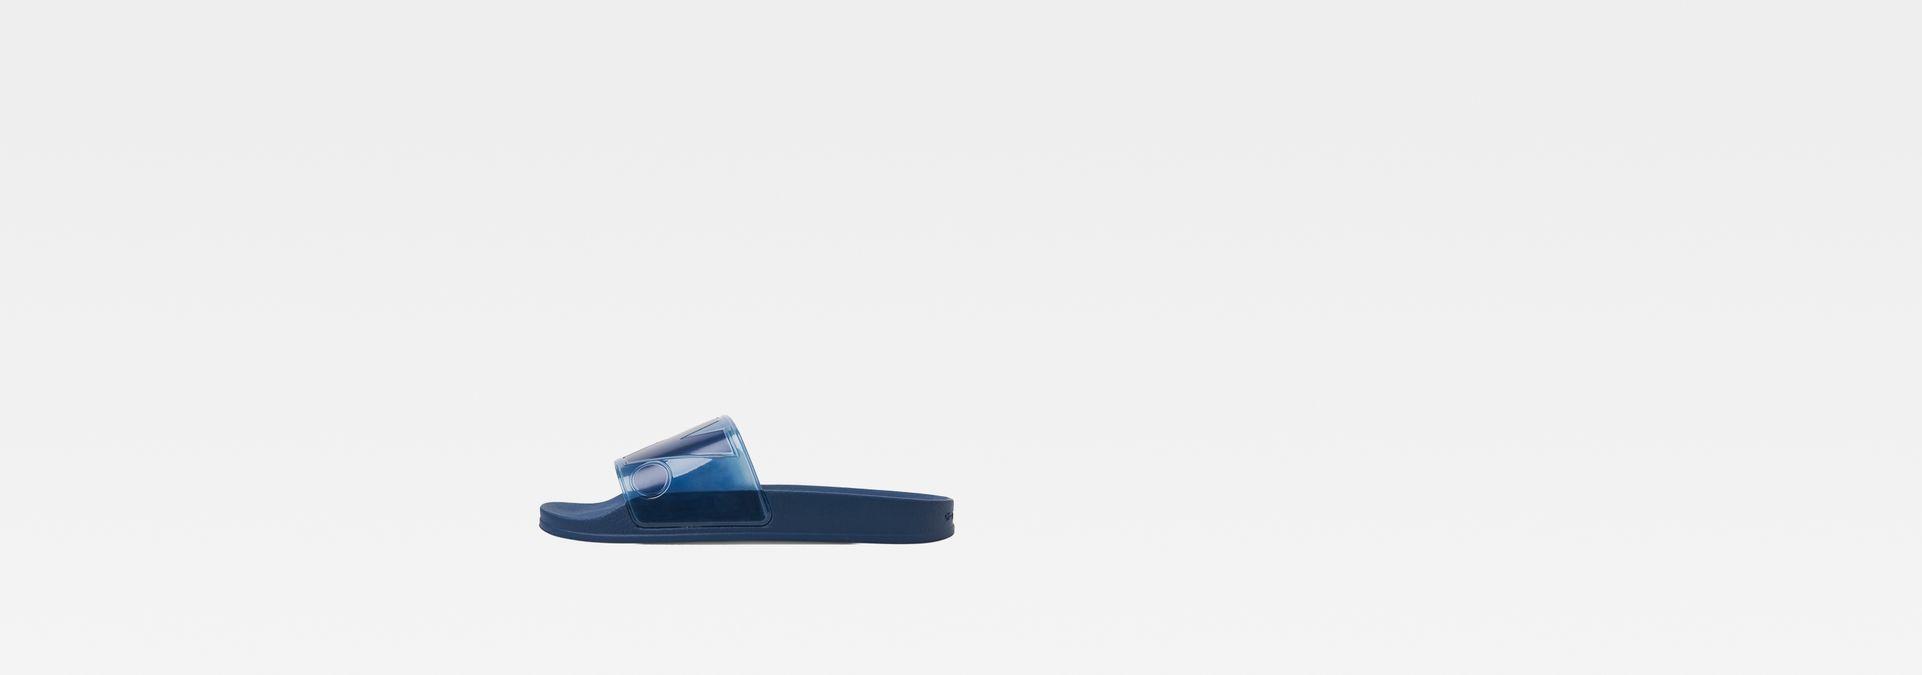 1f235e3fae5 G-Star RAW® Cart Slide II Transparent Azul oscuro side view ...